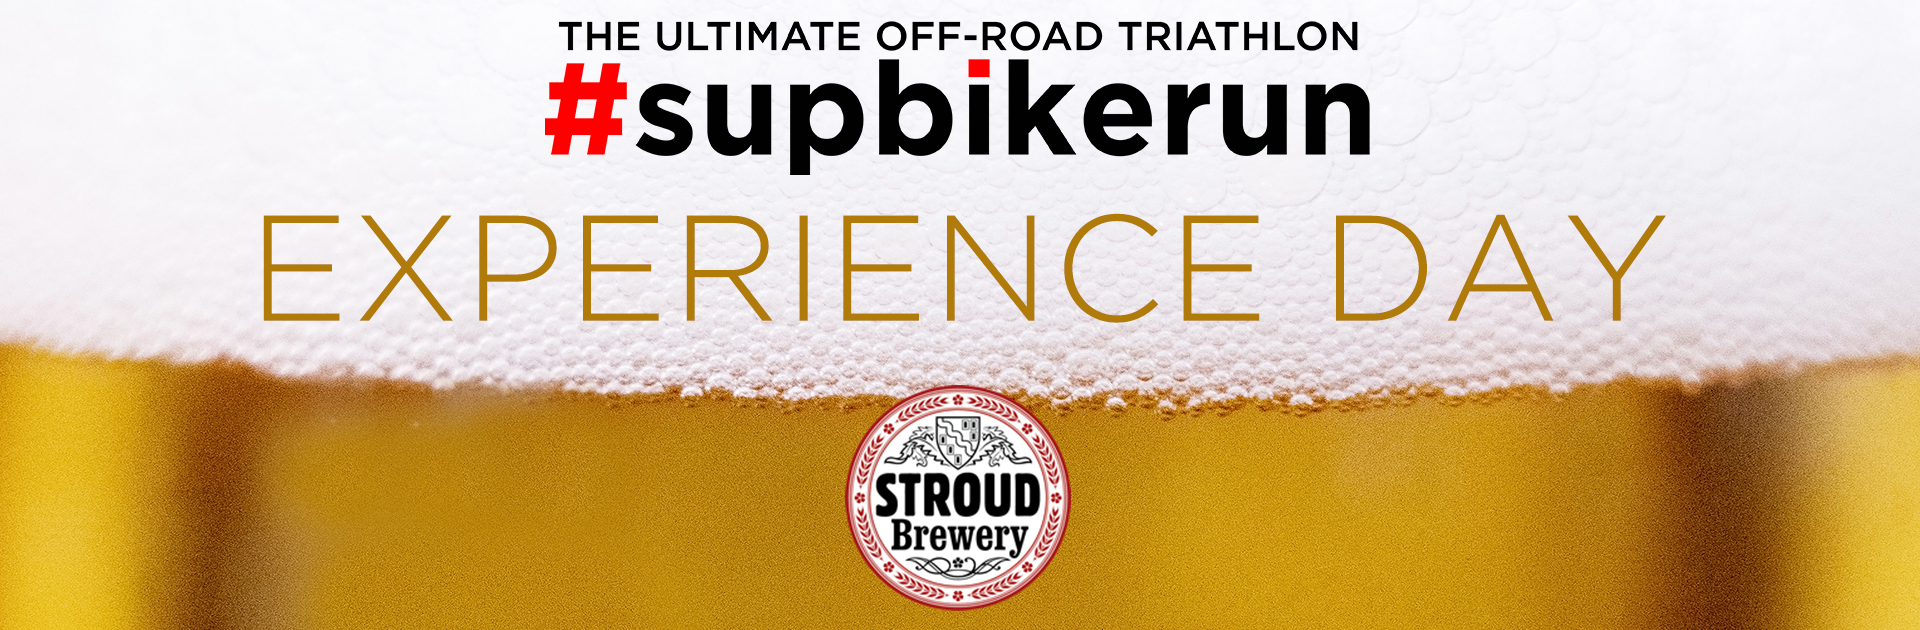 #supbikerun Experience Days